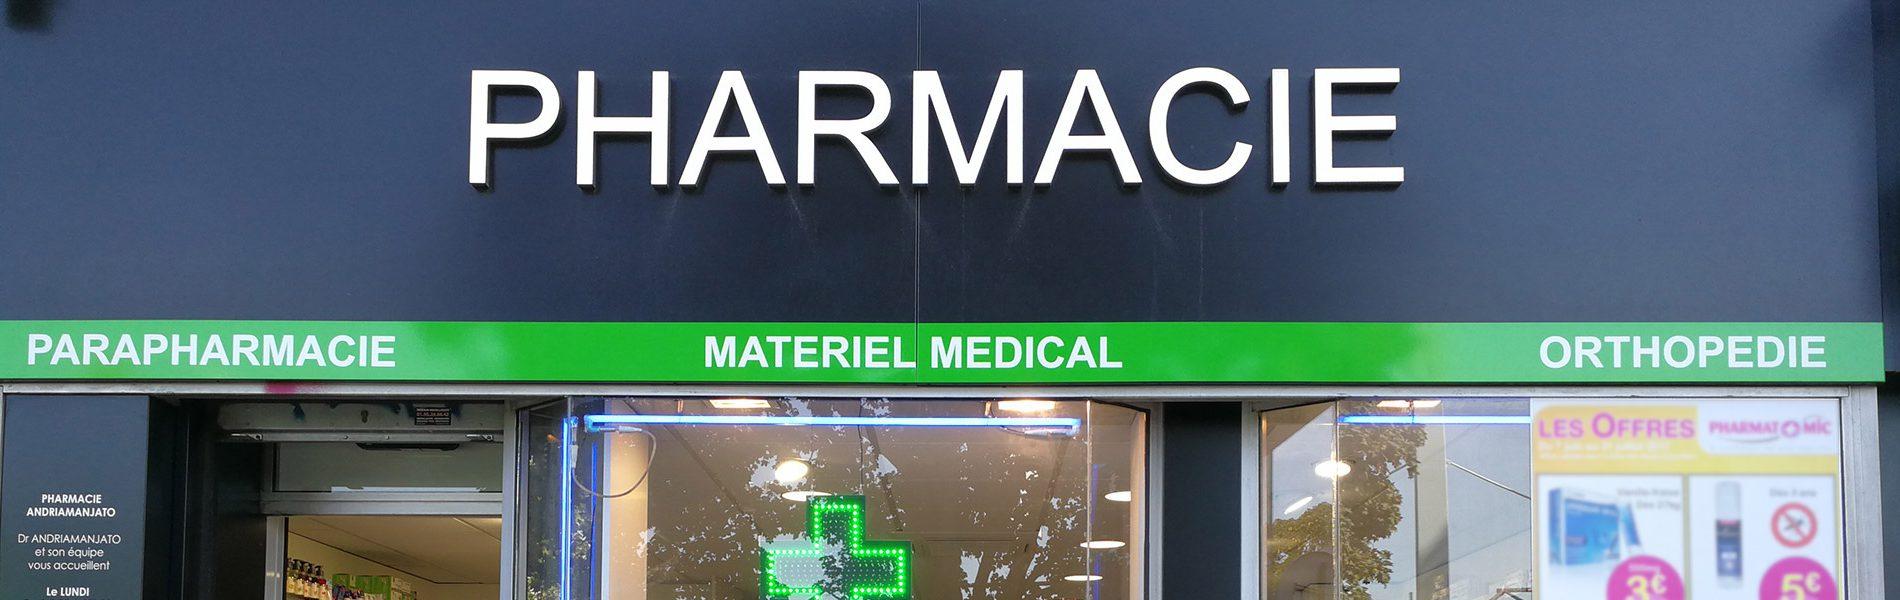 Pharmacie ANDRIAMANJATO - Image Homepage 1